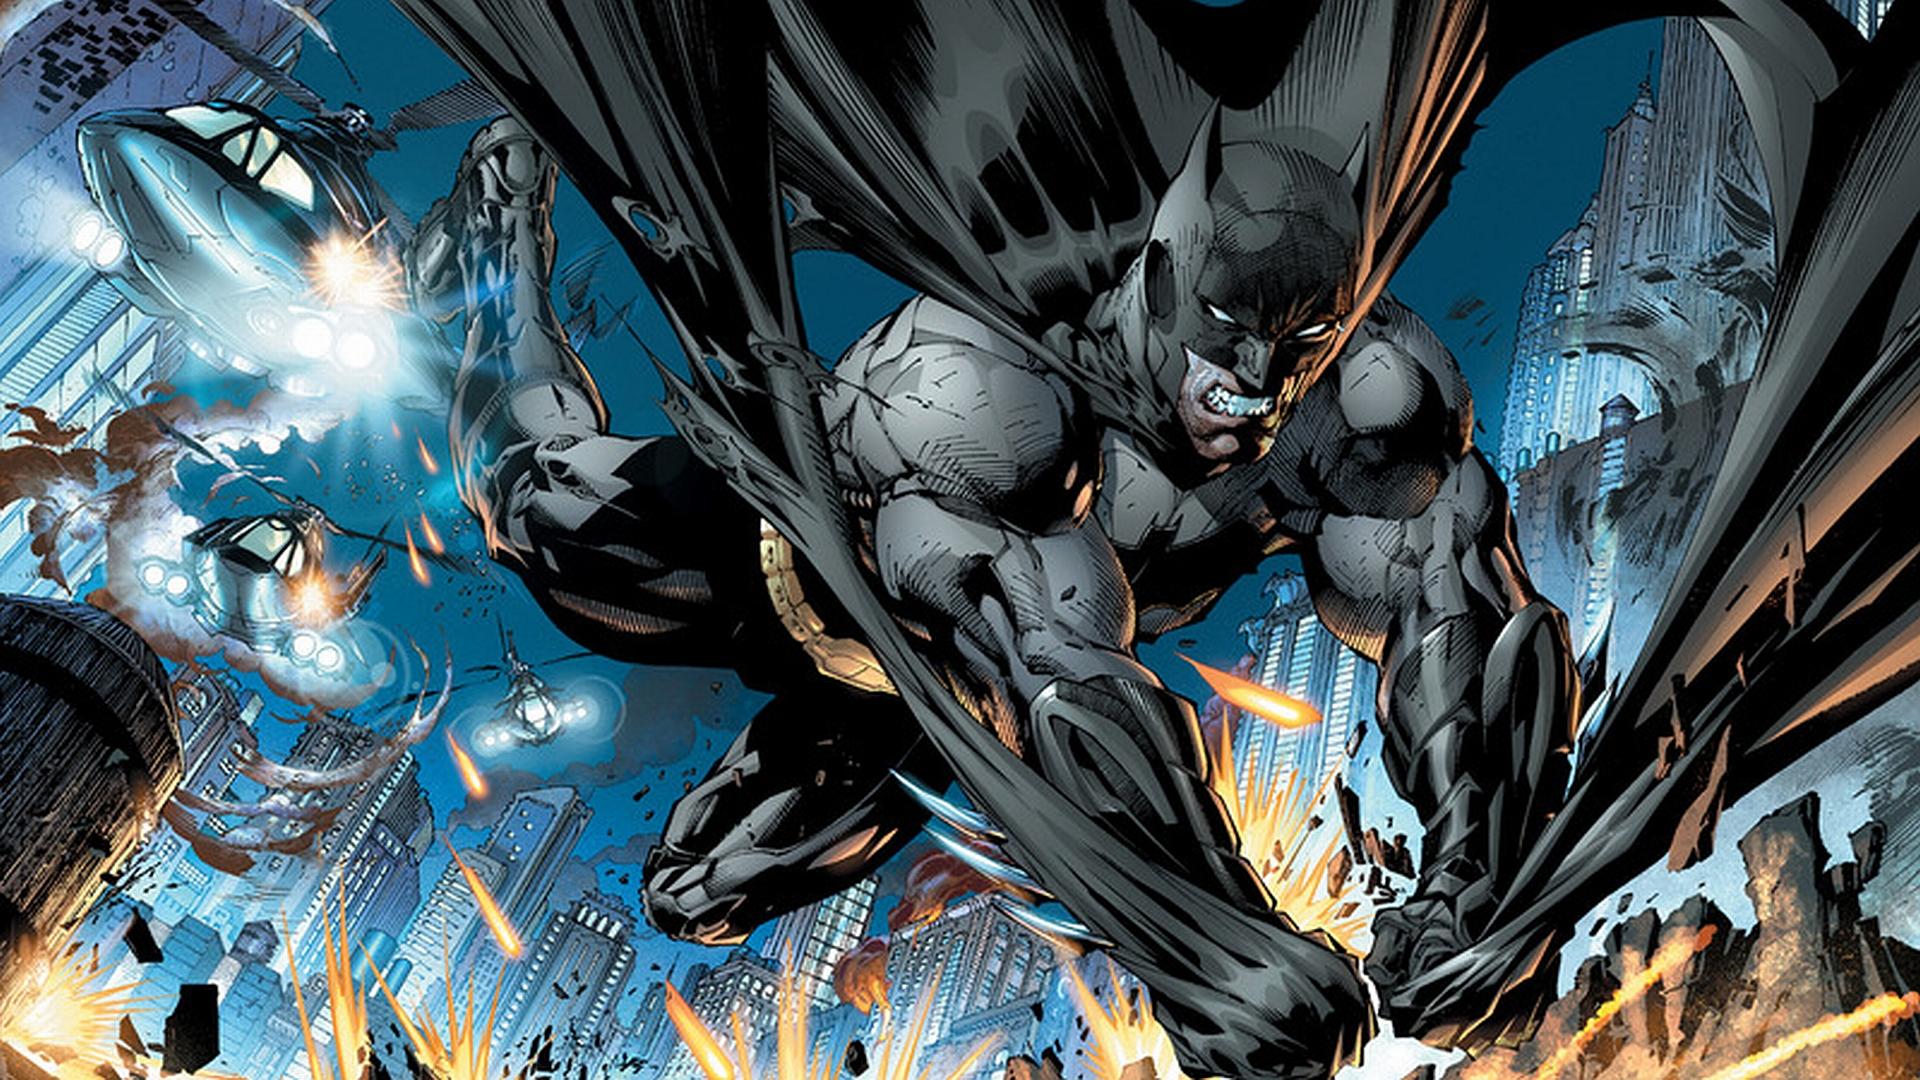 batman full hd wallpaper and background image | 1920x1080 | id:171185